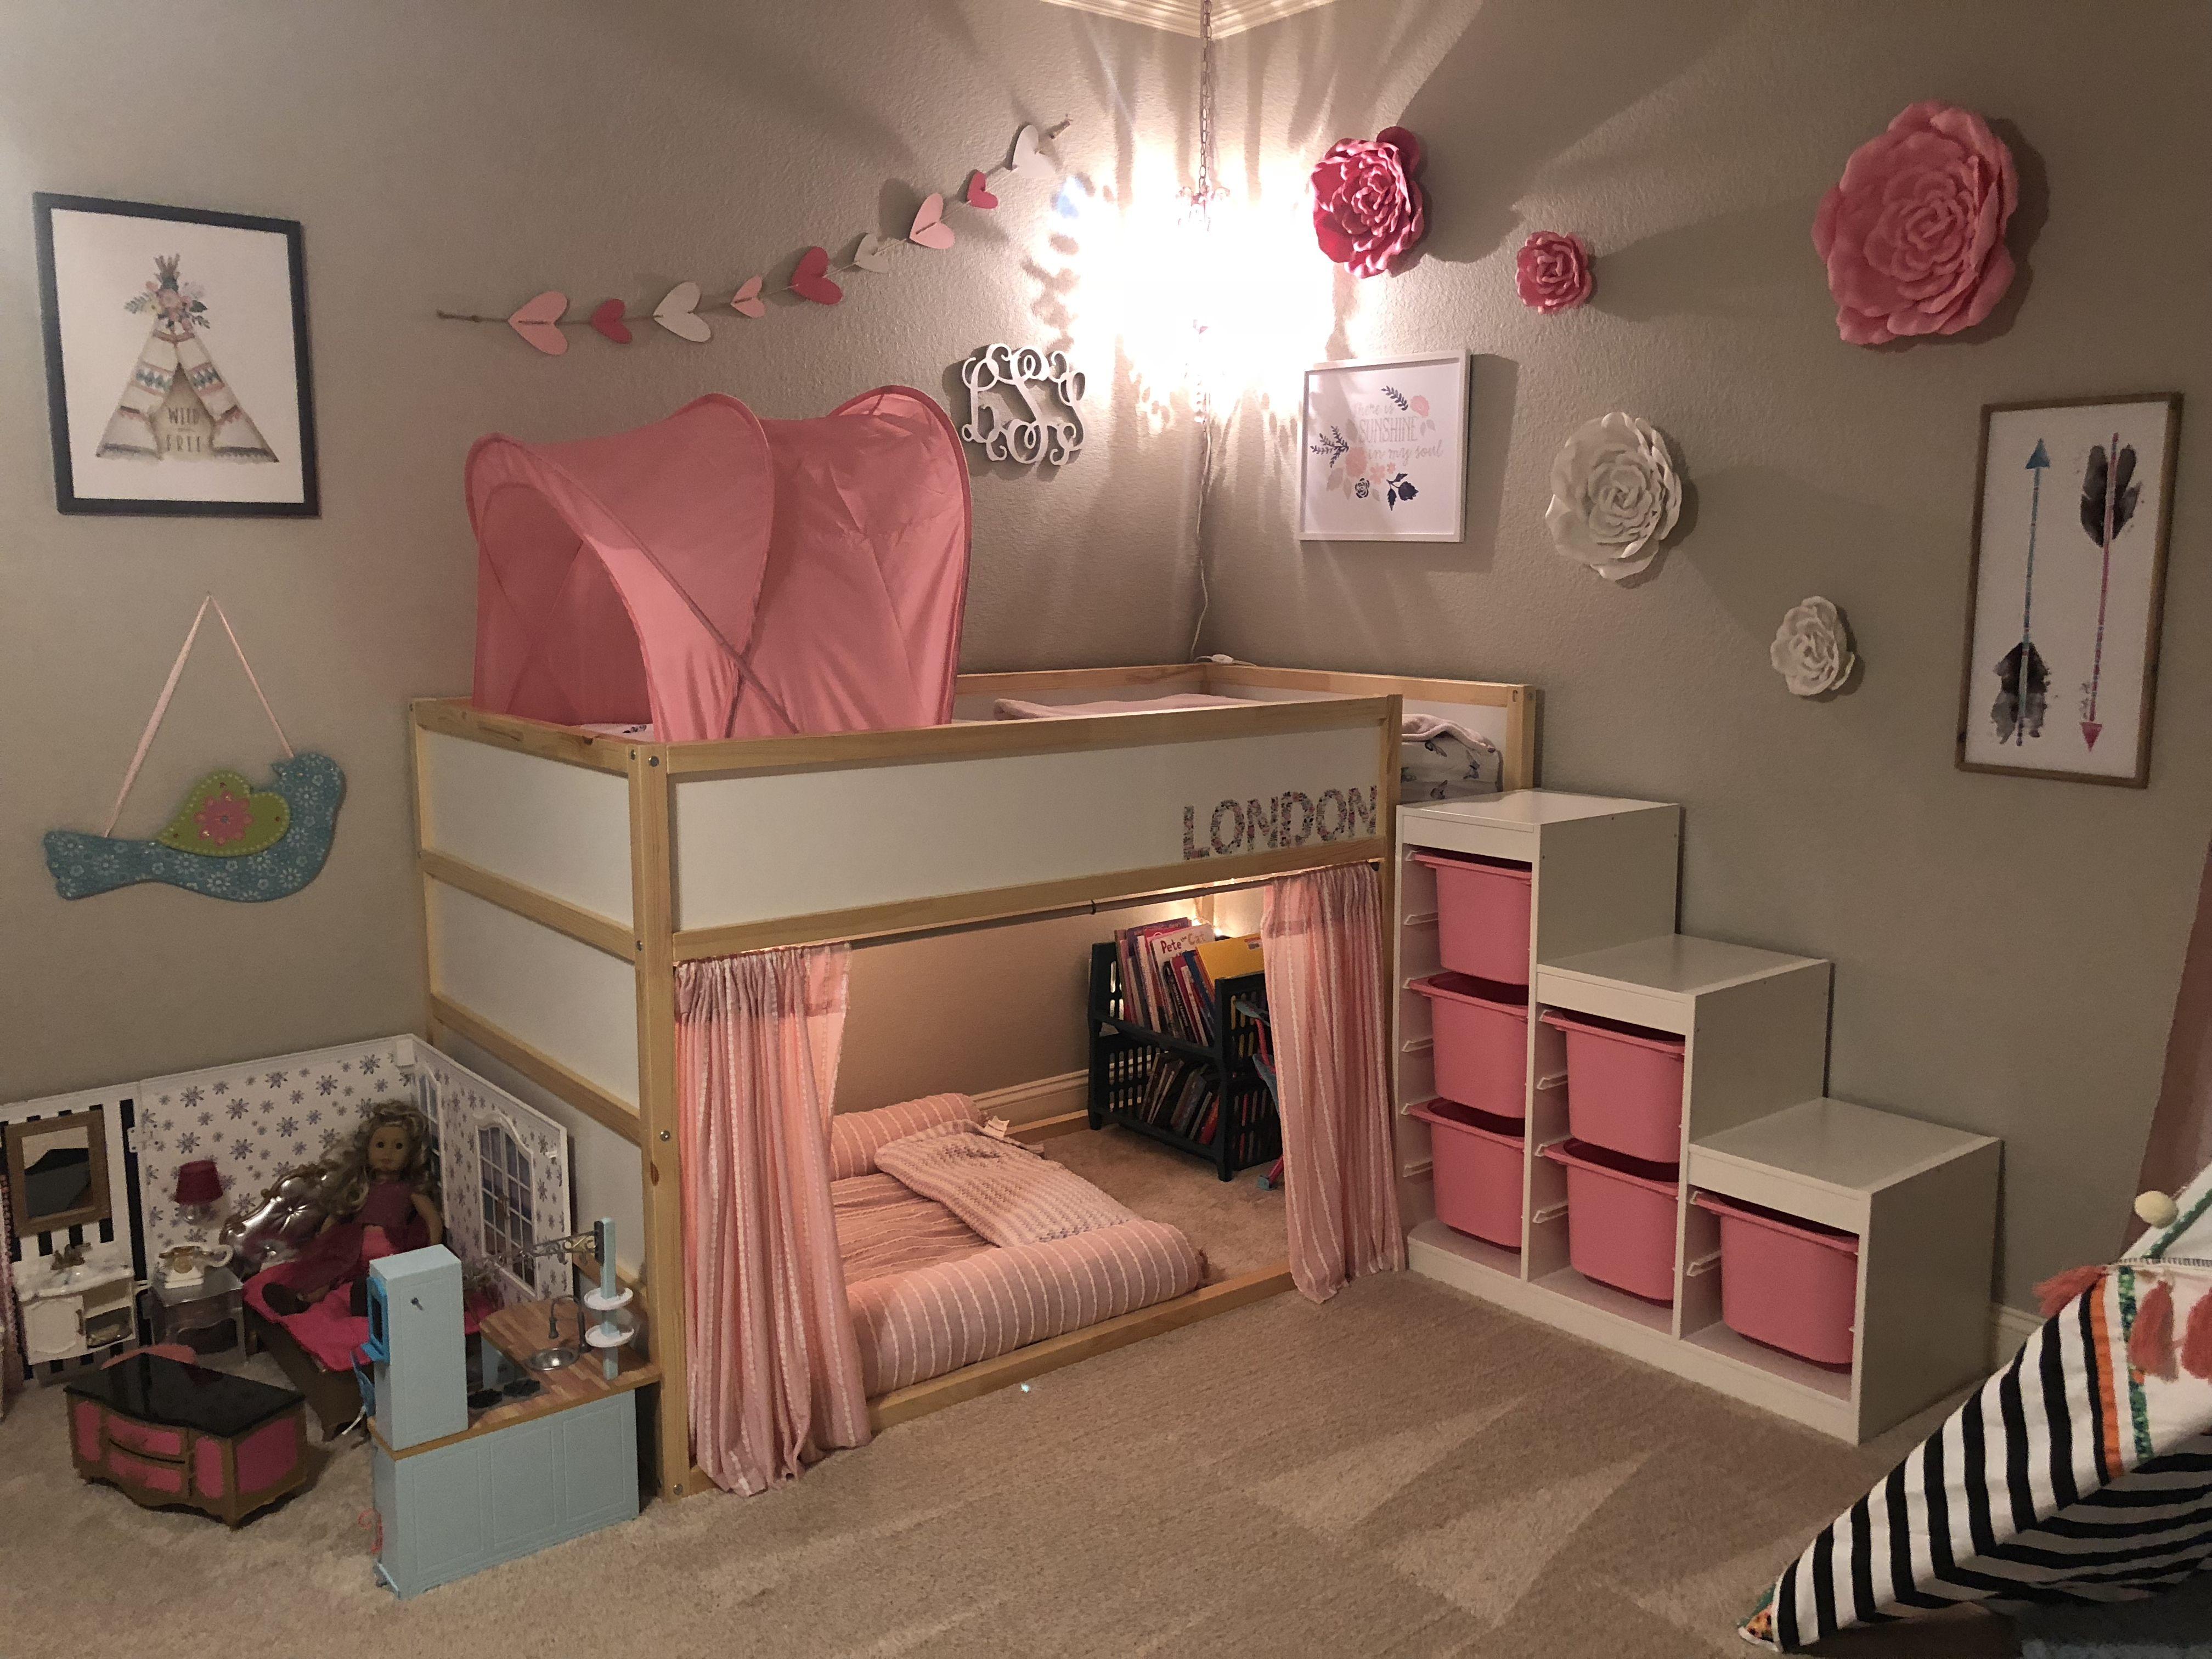 Ikea Kura Bed For London Is Finally Finished Kids Loft Beds